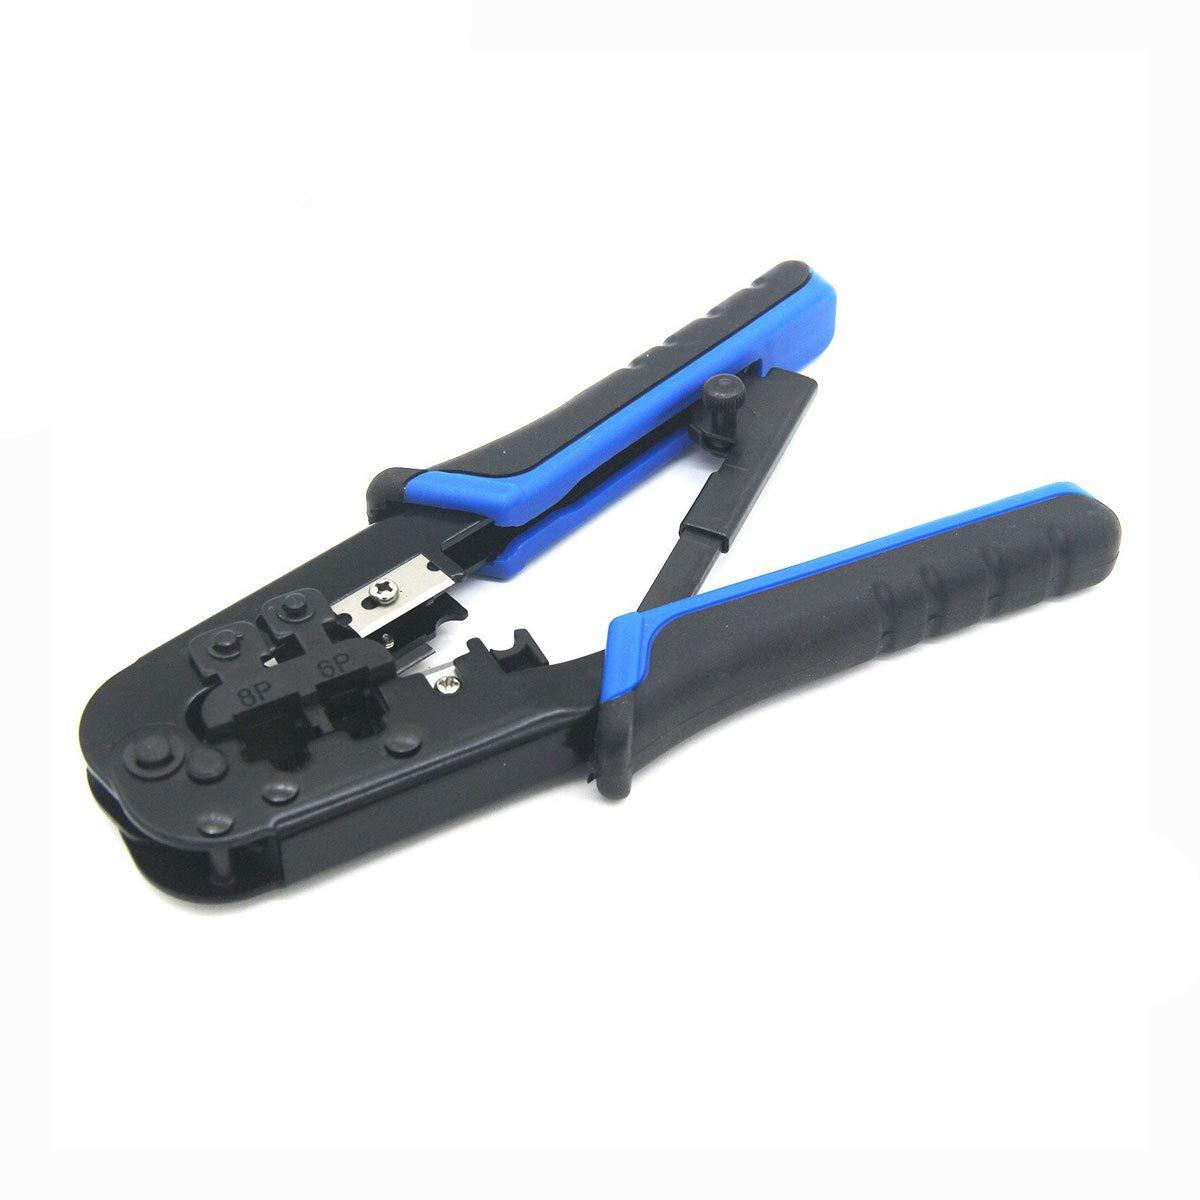 Ethernet Crimping Tool,V-Resouring Ratcheting Wire Crimper Cutter Stripper Pliers for EthernetCable RJ45 RJ12 RJ11 by V-Resourcing